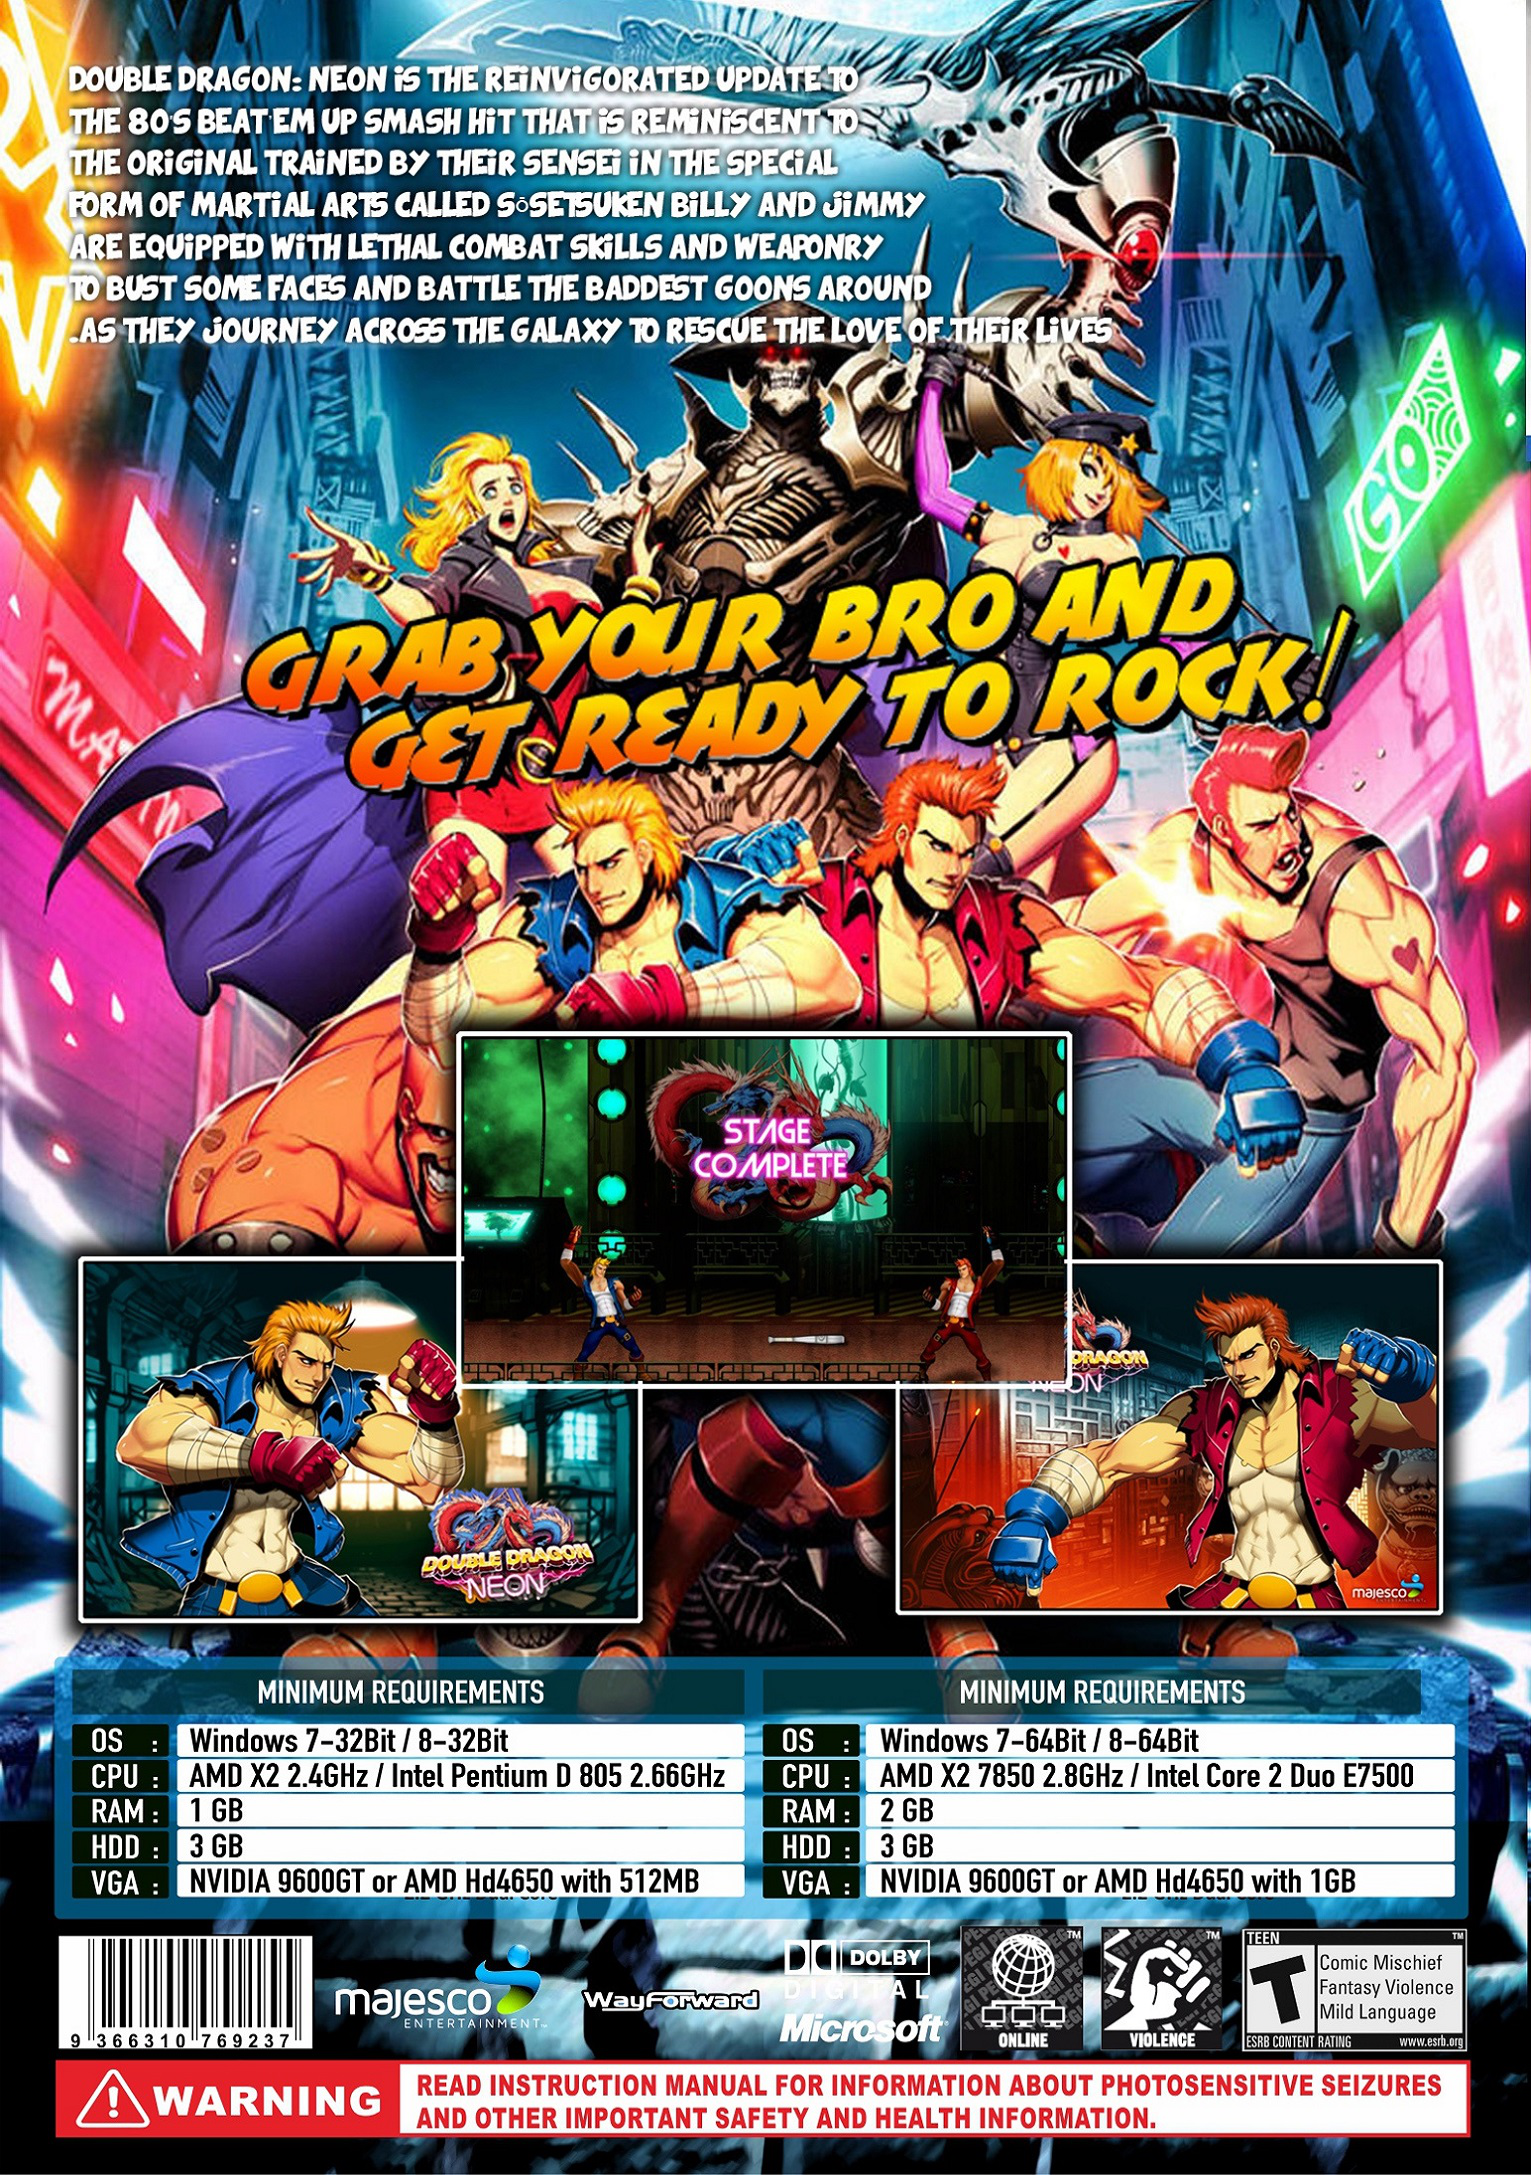 Double Dragon Neon Details Launchbox Games Database